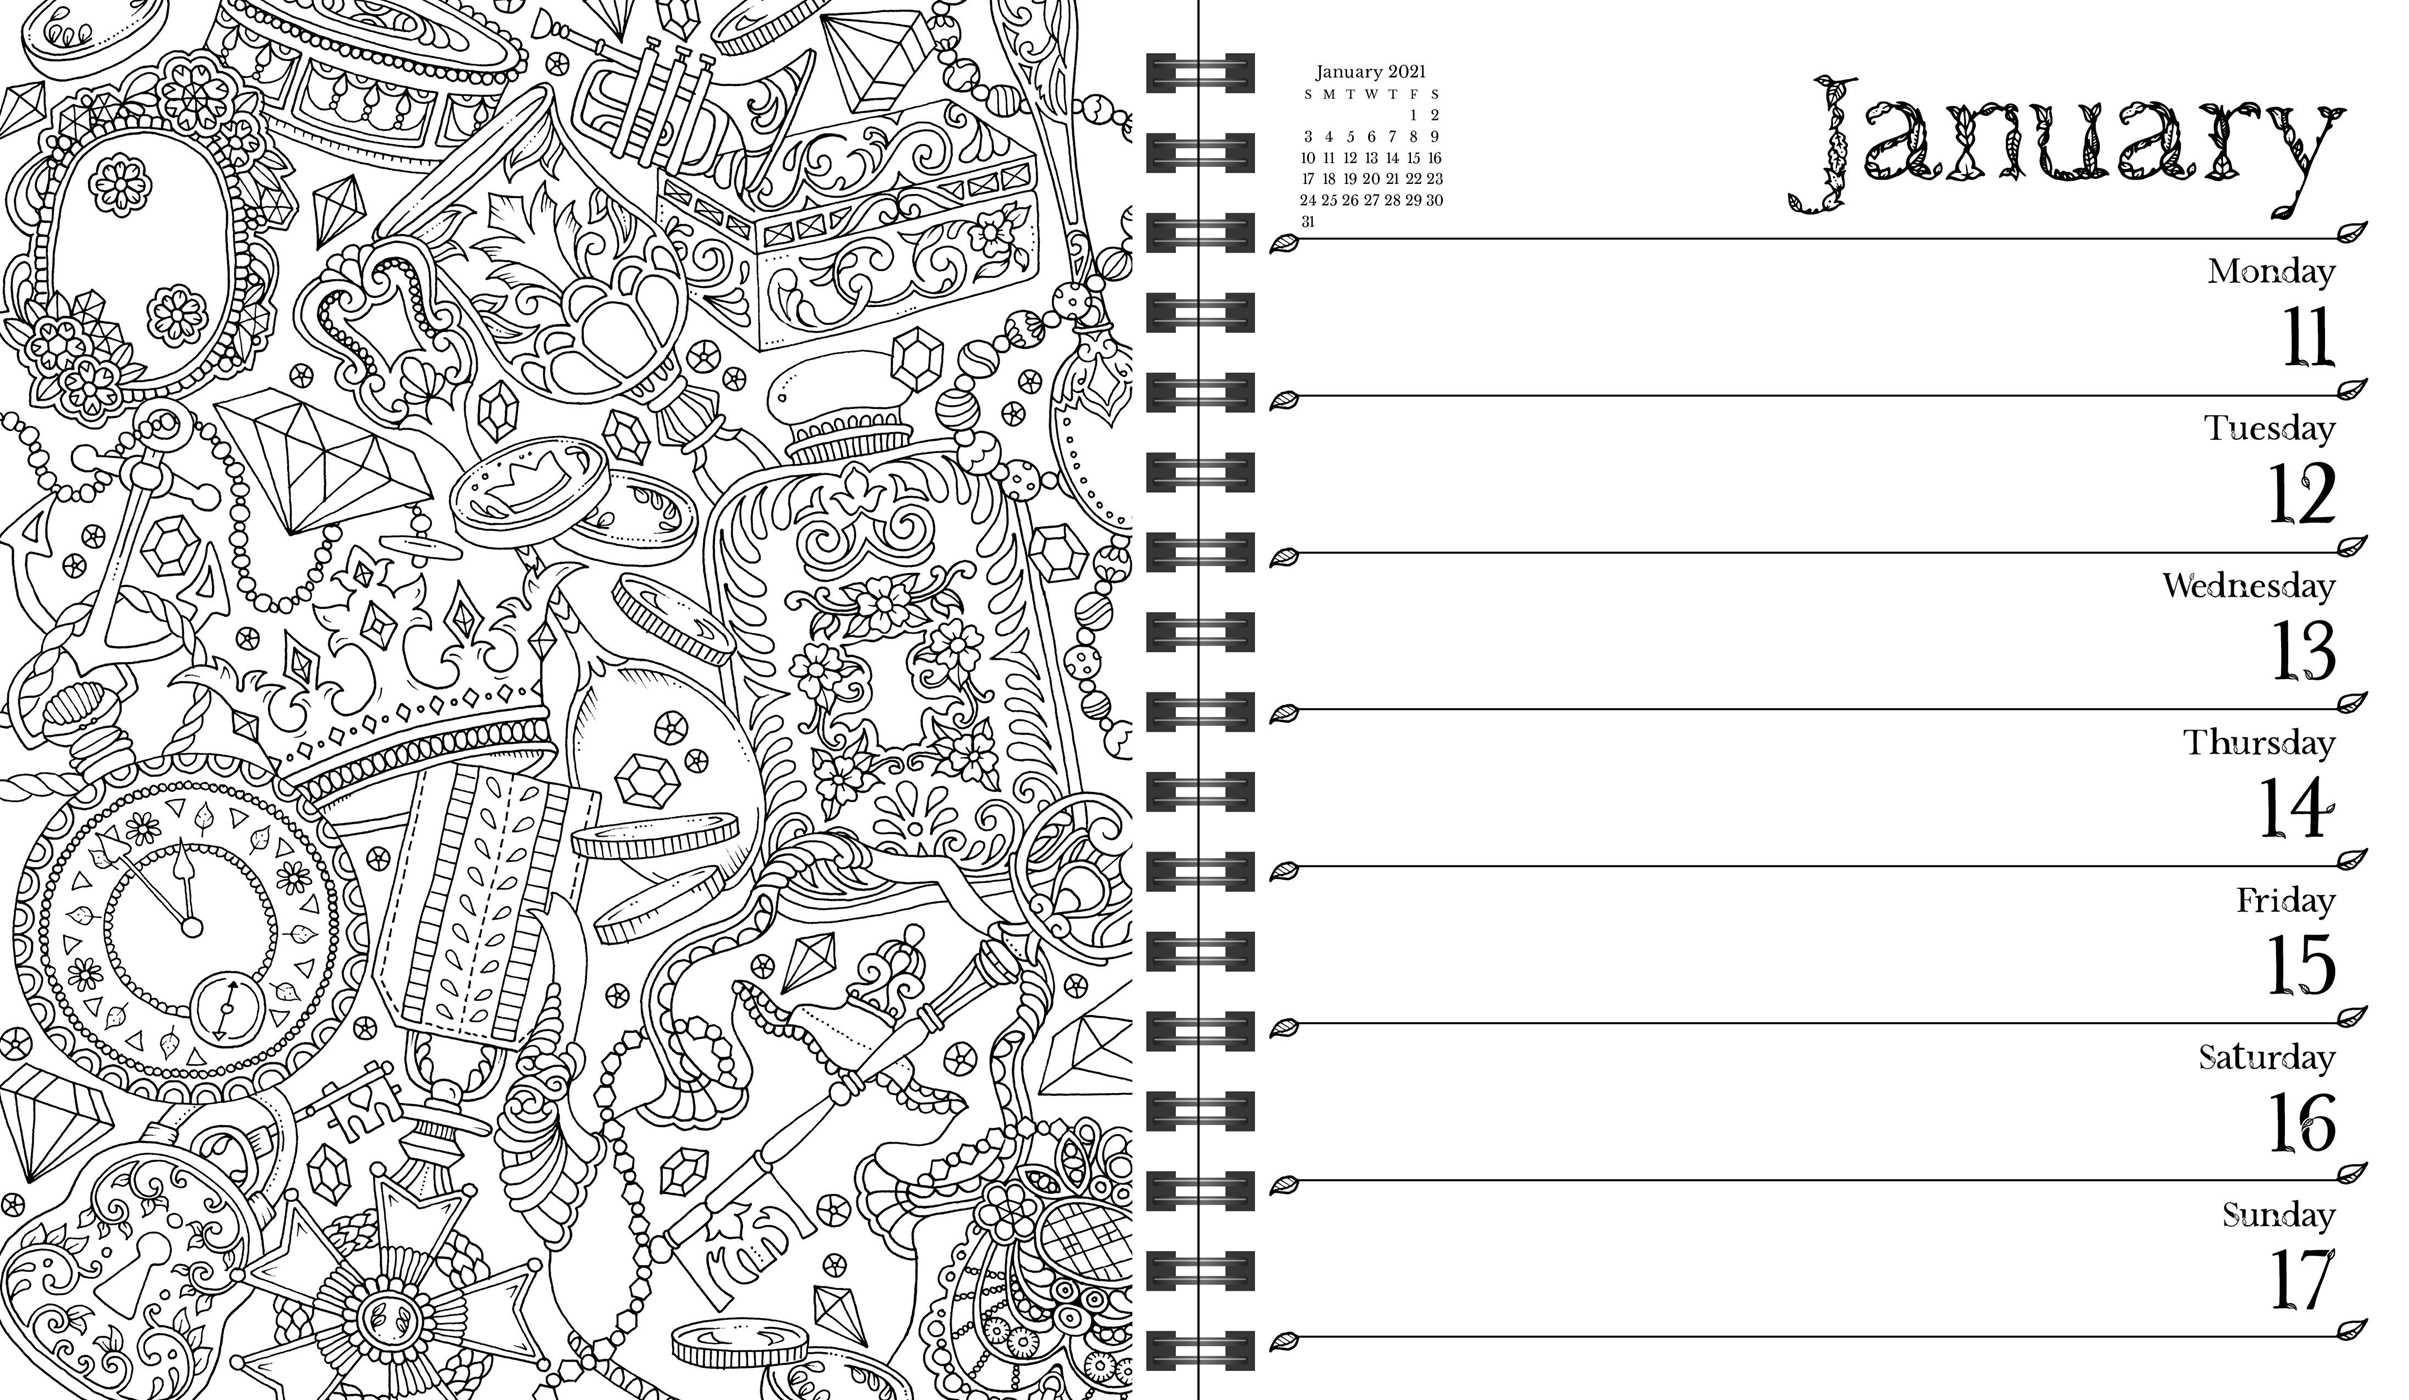 - Johanna Basford 2021 Weekly Coloring Planner Calendar - Book